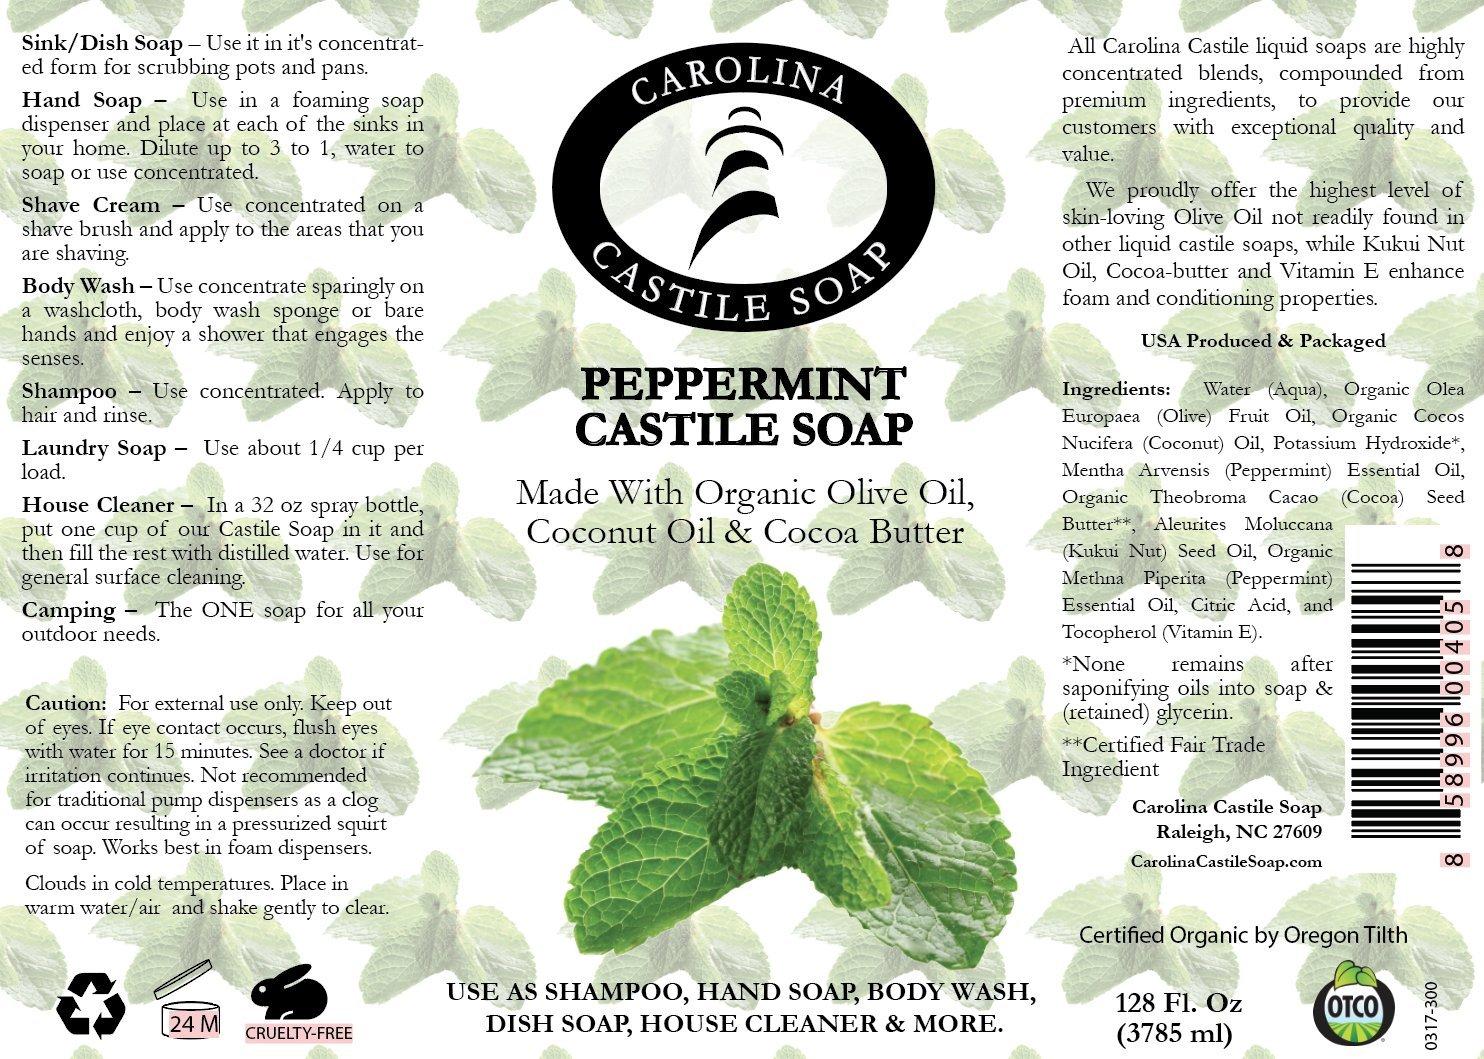 Carolina Castile Soap Peppermint | Certified Organic - 1 Gallon by Carolina Castile Soap (Image #2)